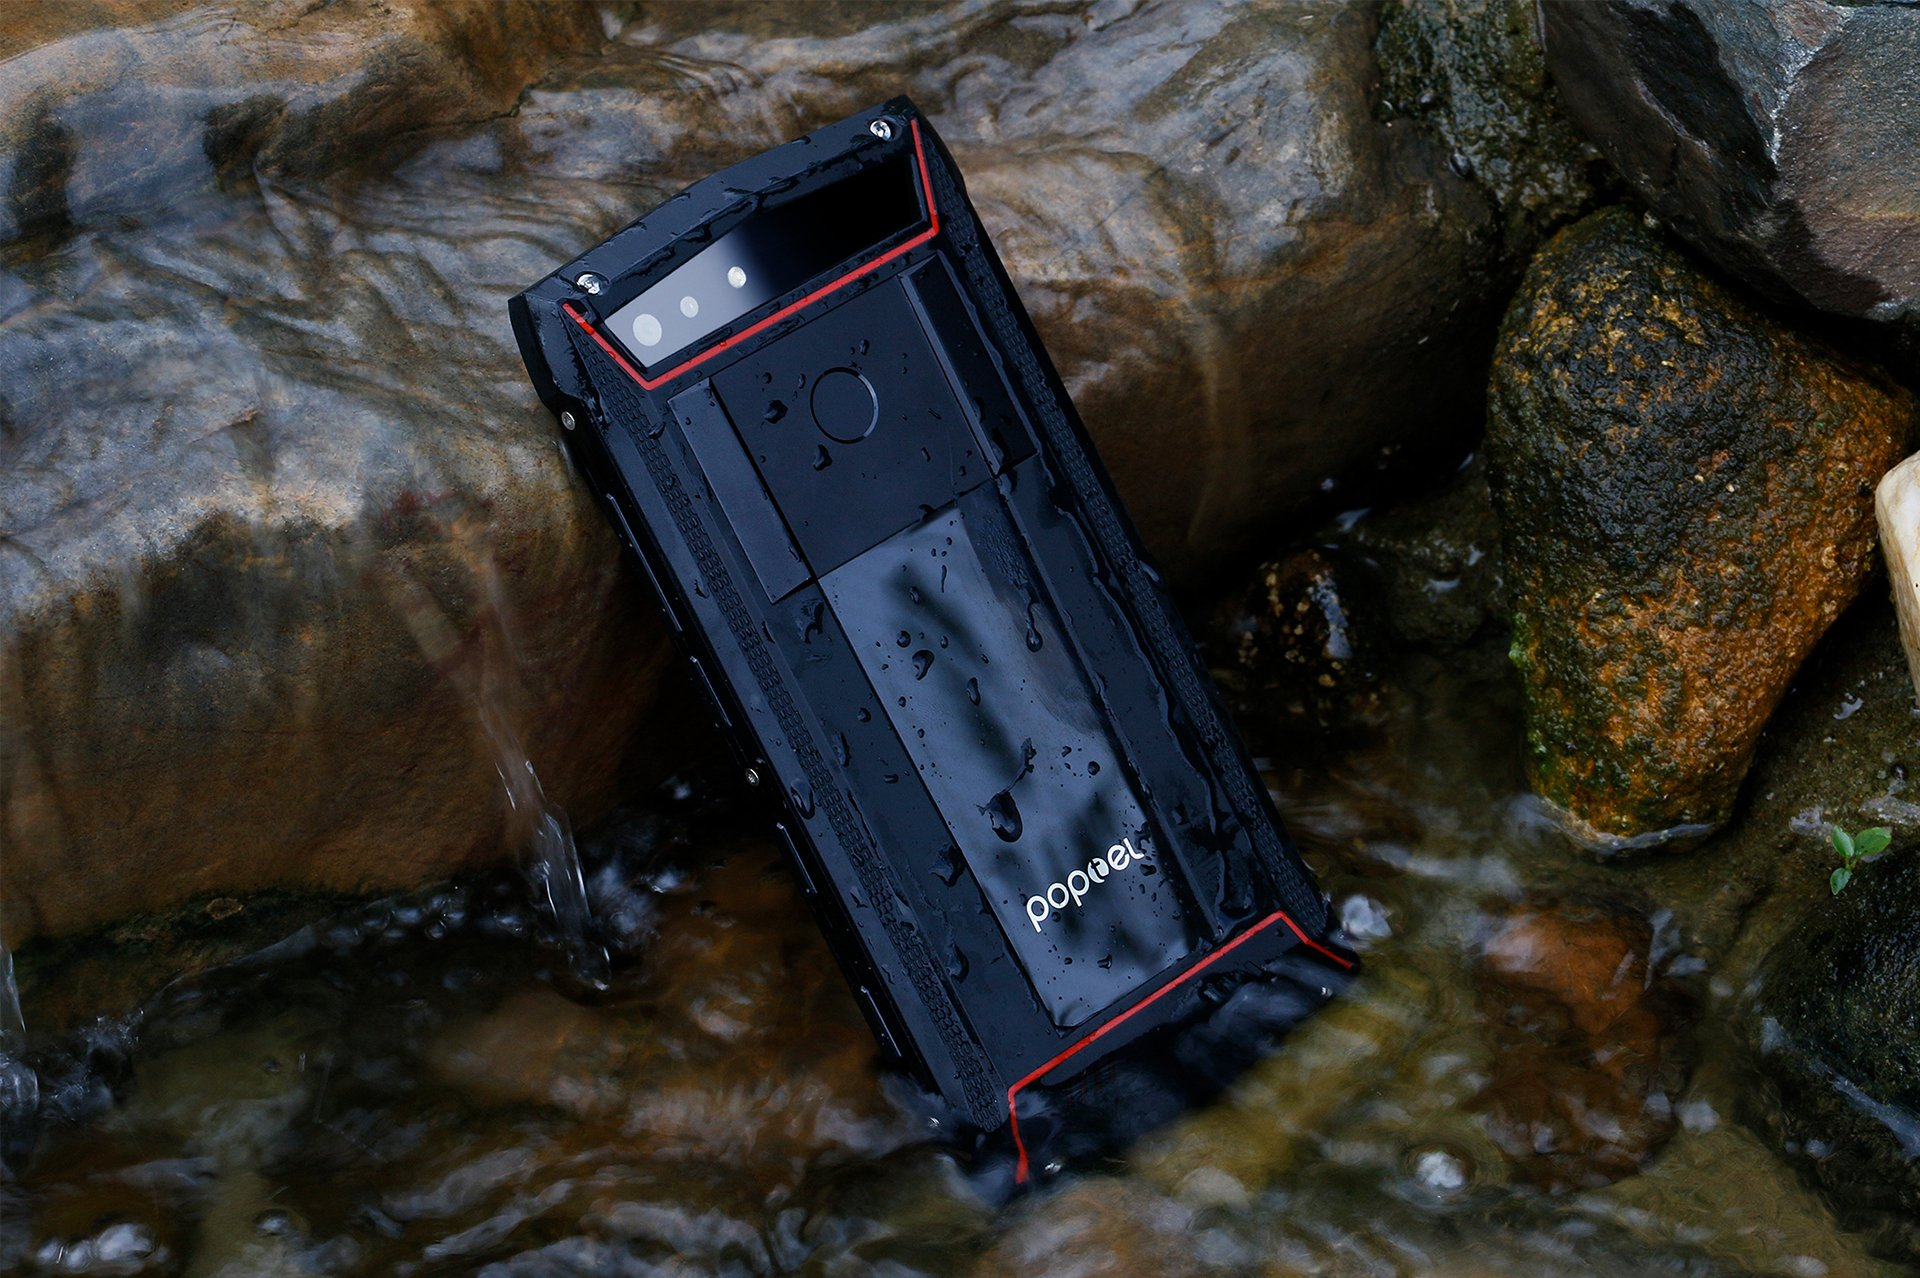 Poptel P60 128GB выходит против Galaxy S8 Active